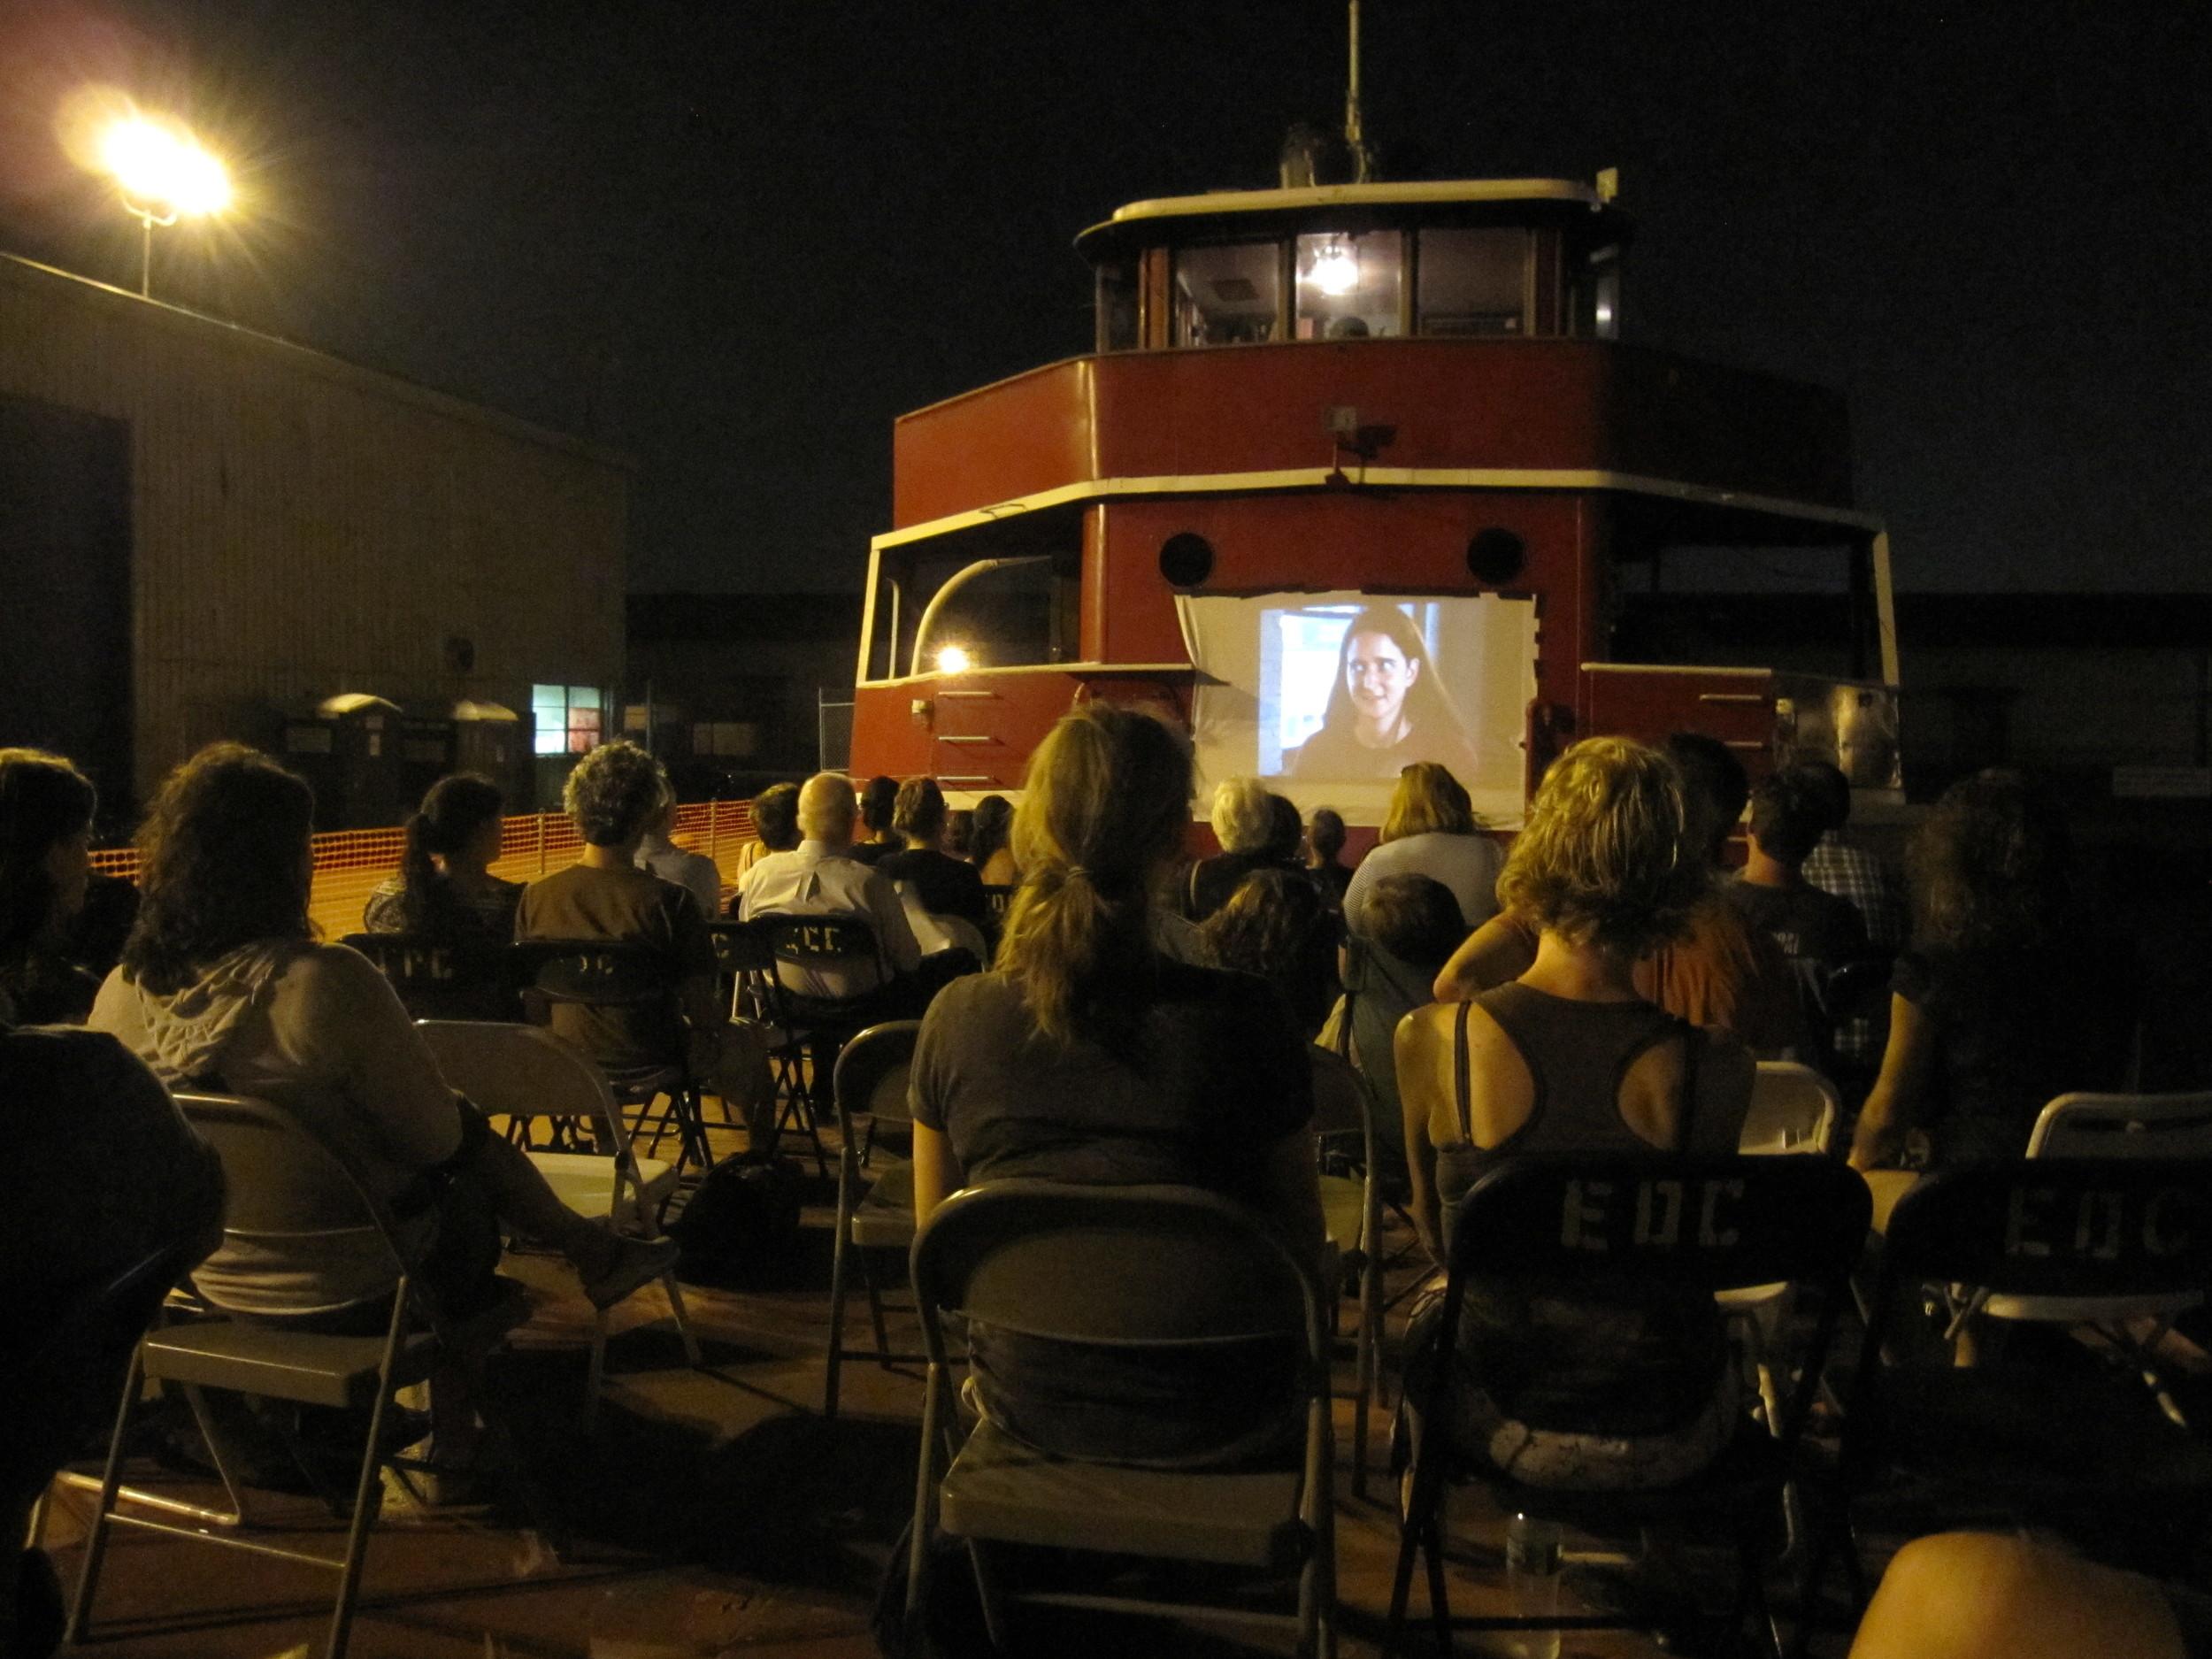 100824 TankerFlick Ferry Tales 006.jpg